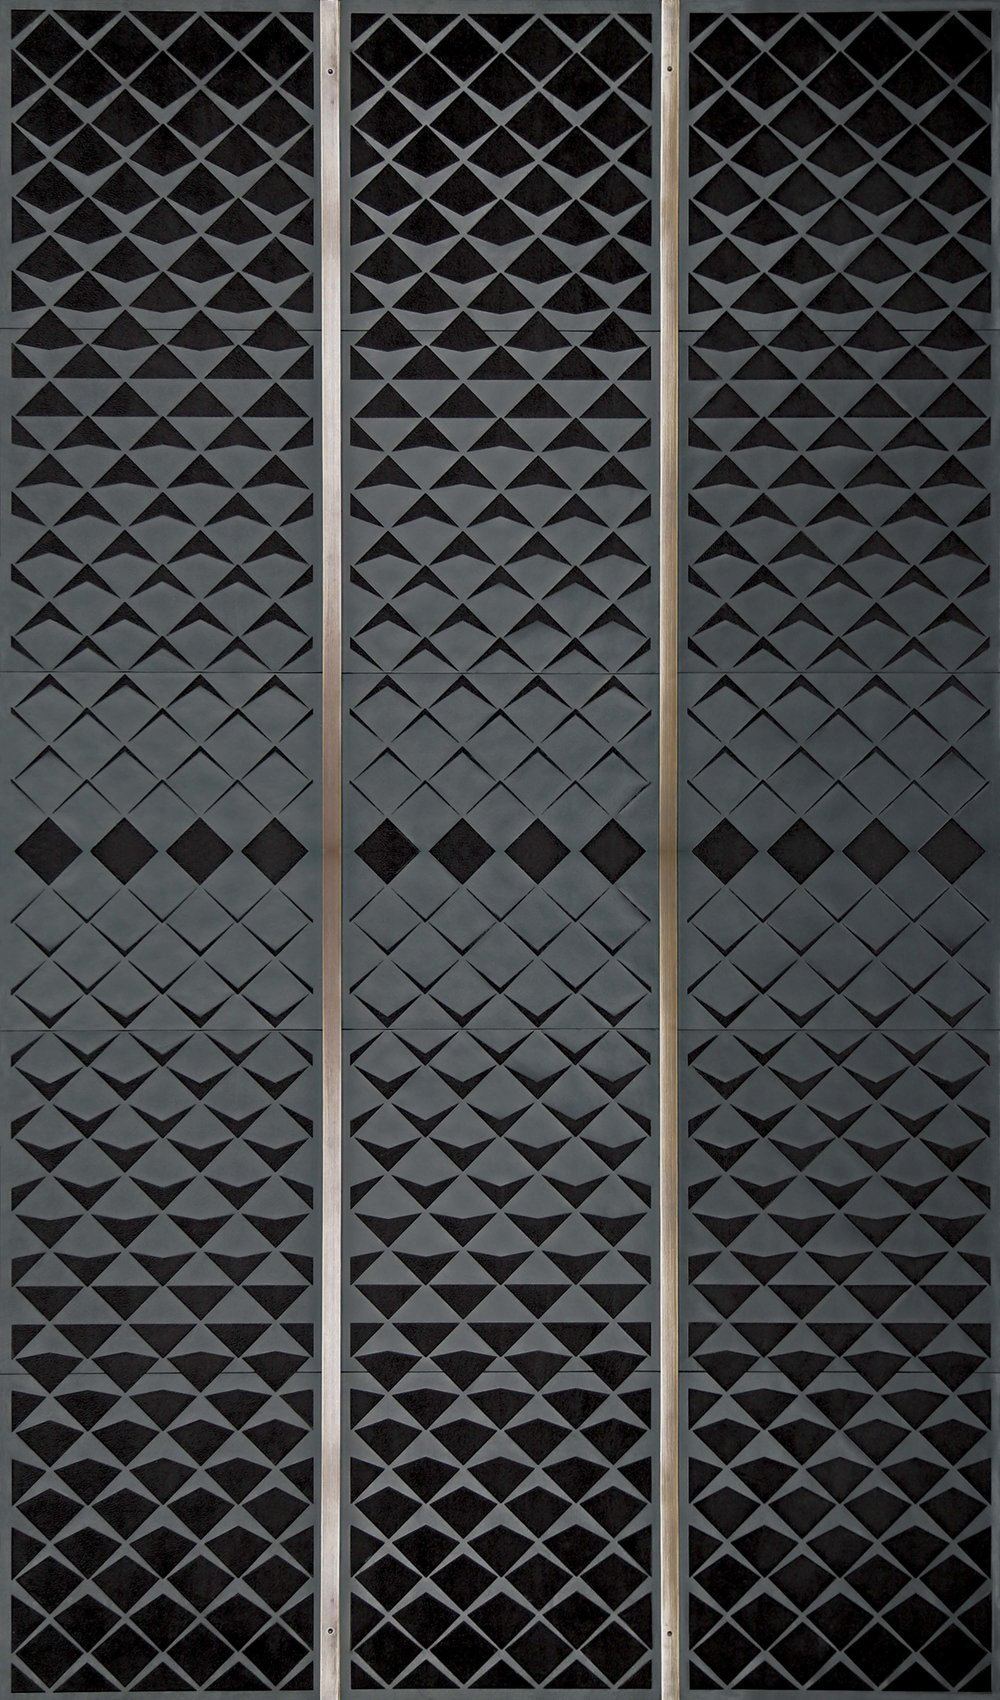 isa-lattice3-02.jpg